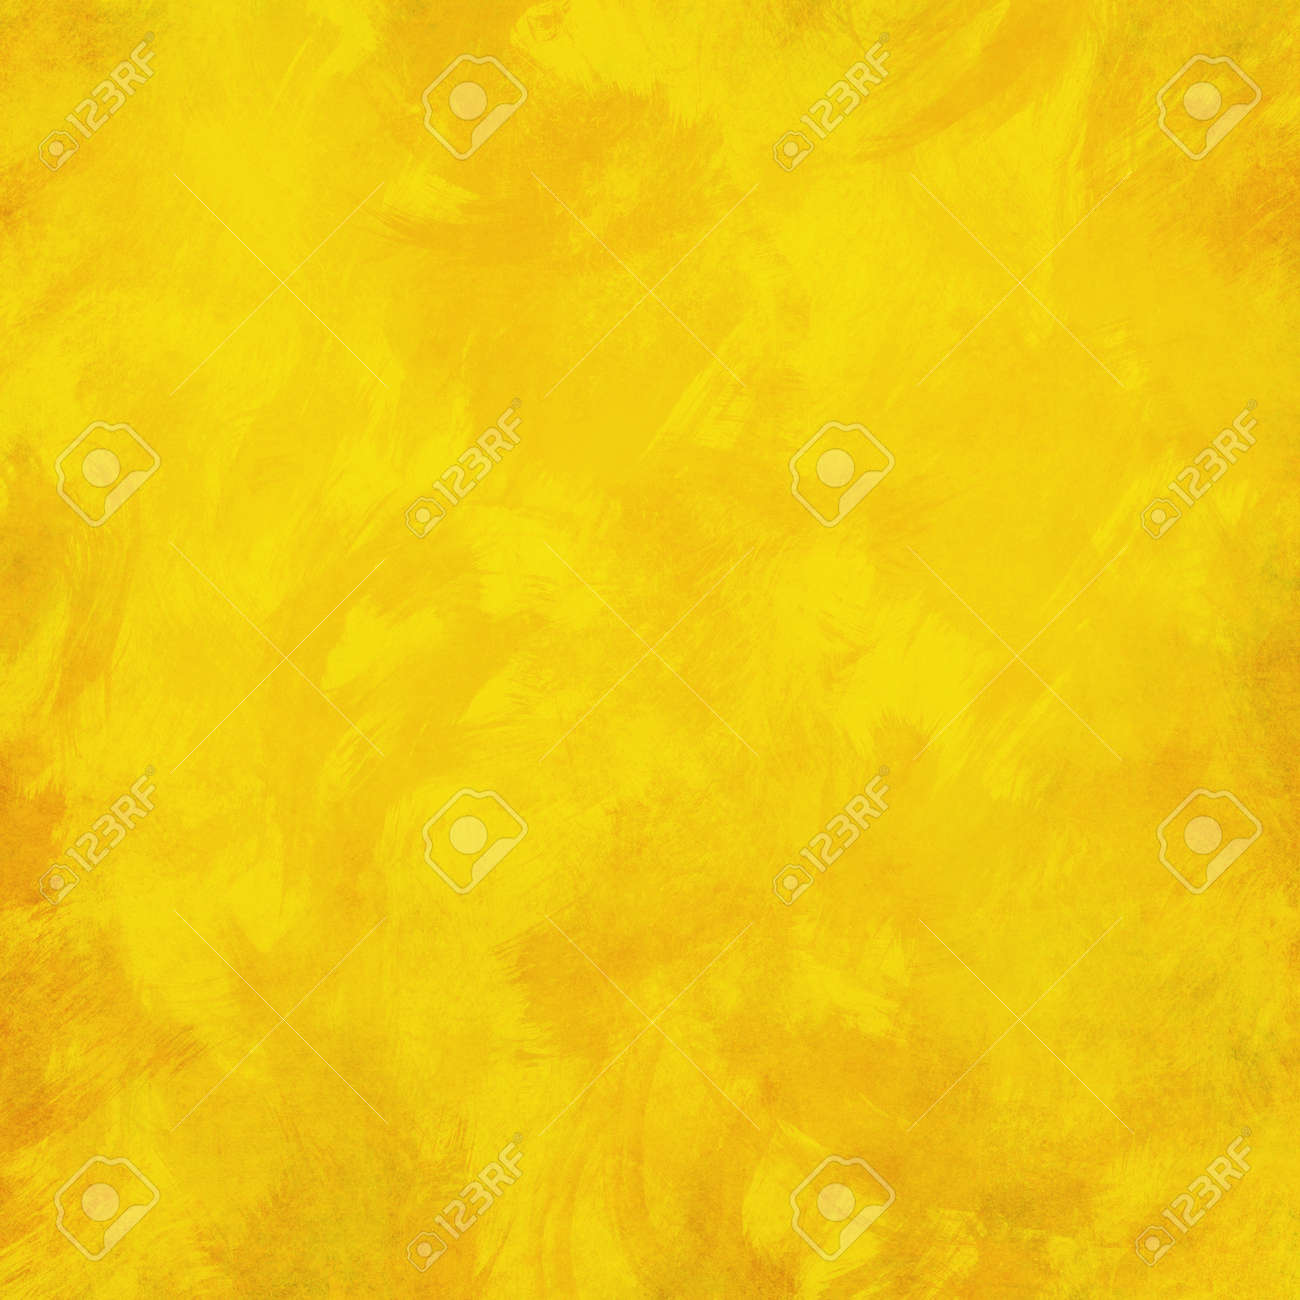 yellow grunge background - 35621453